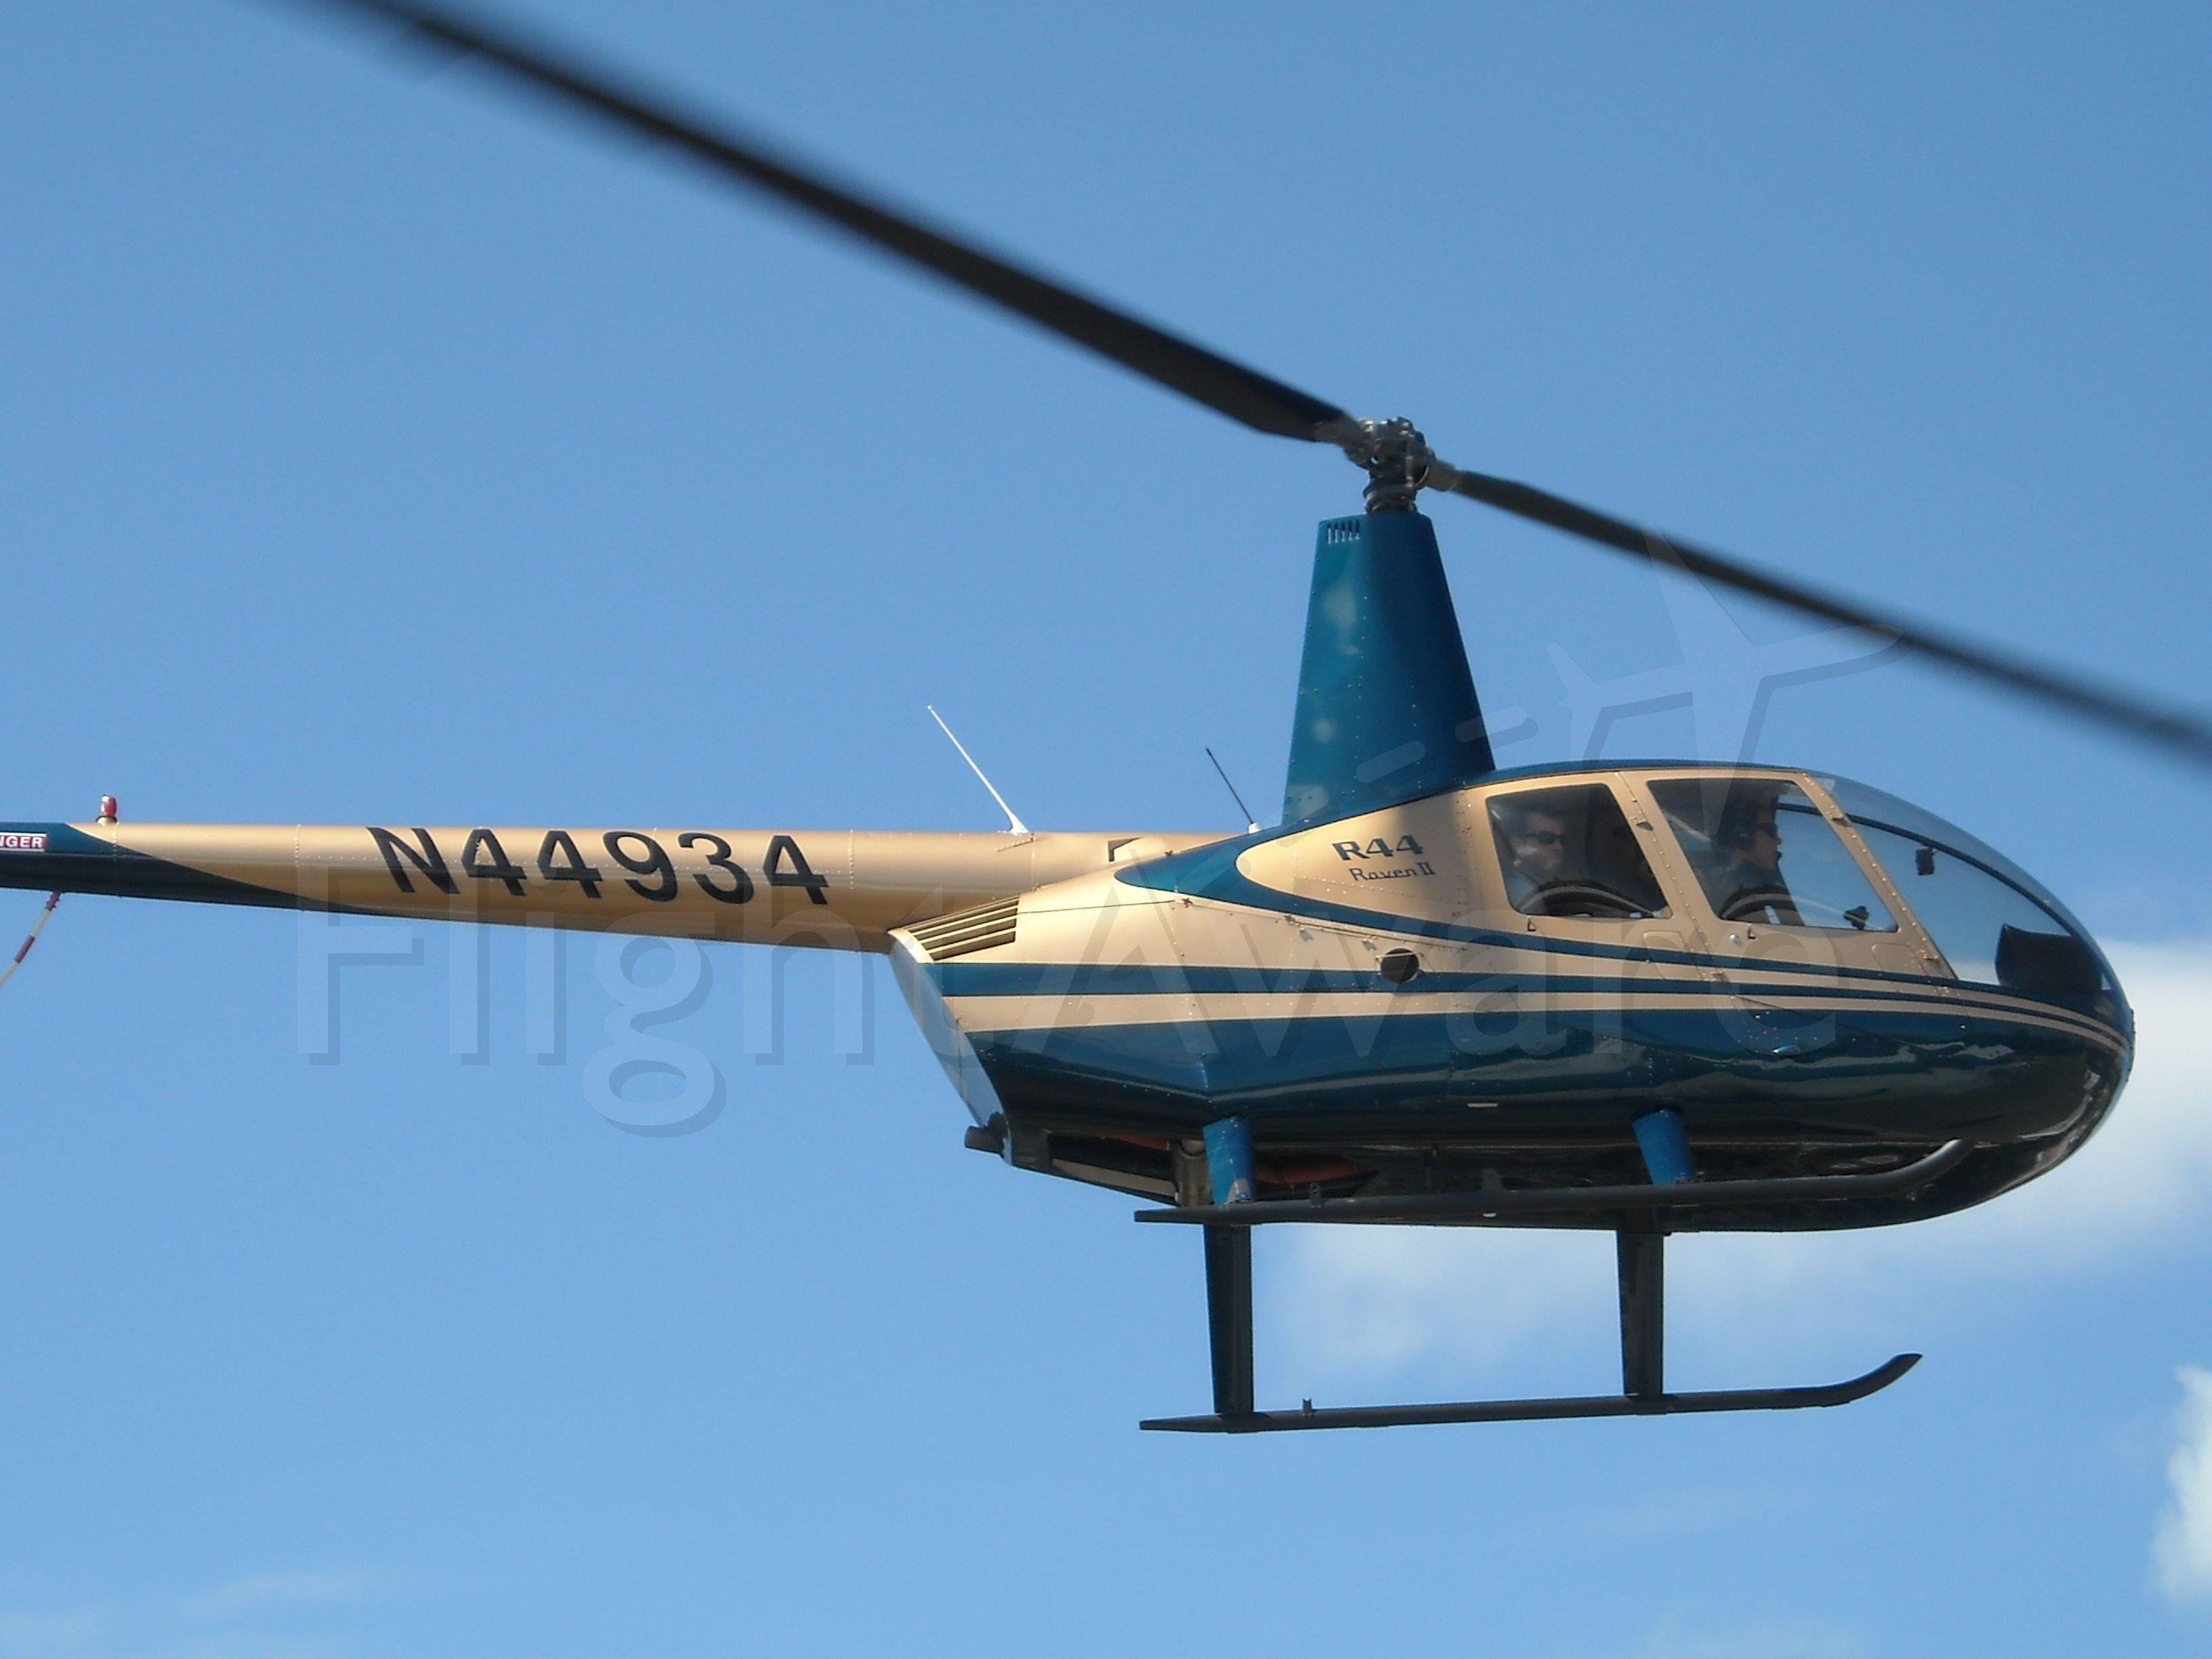 Robinson R-44 (N44934) - WE got visitors !!!!